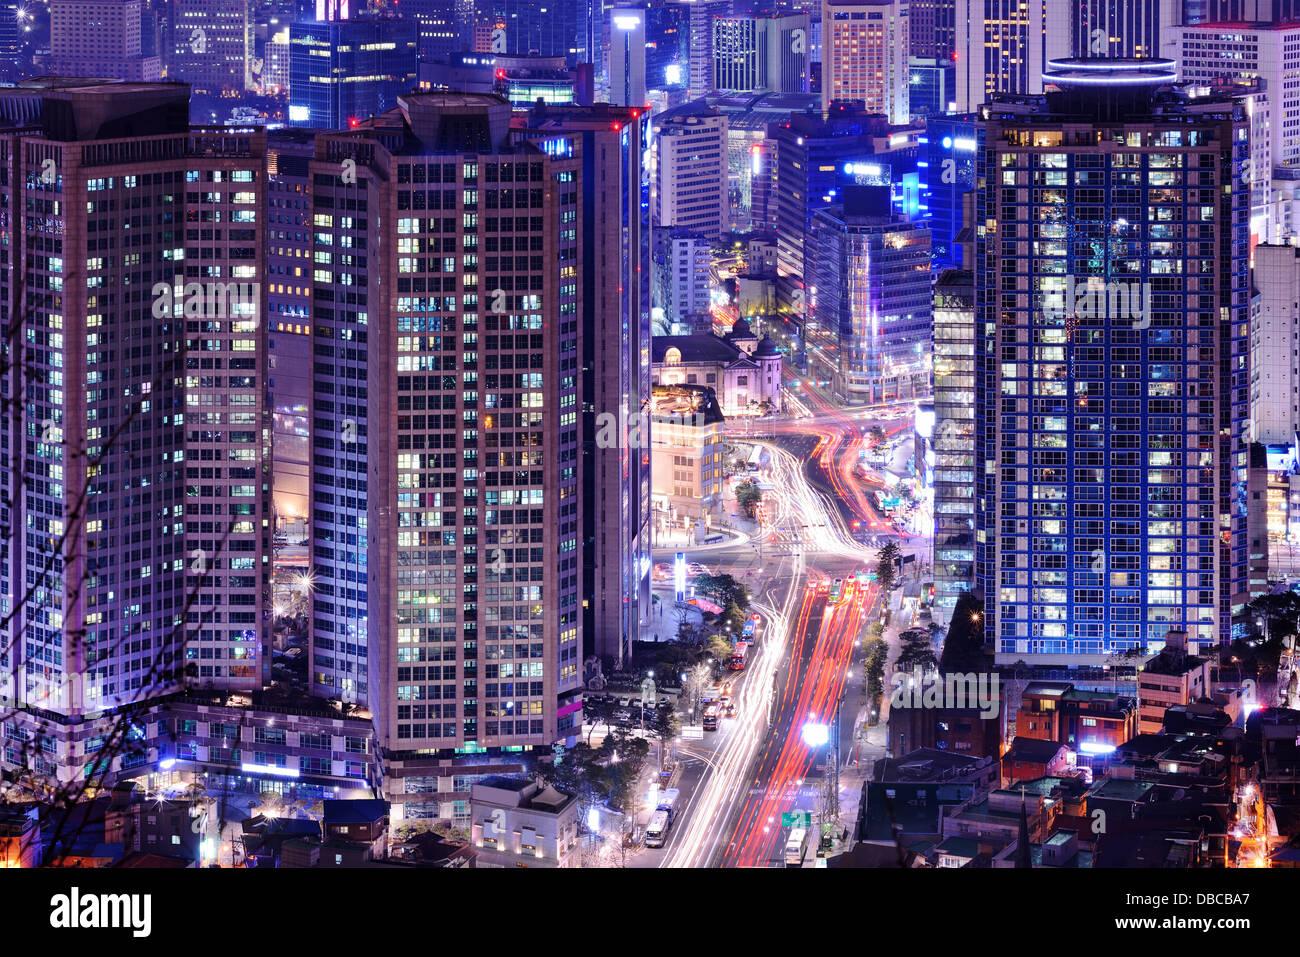 Cityscape of Seoul, South Korea. - Stock Image